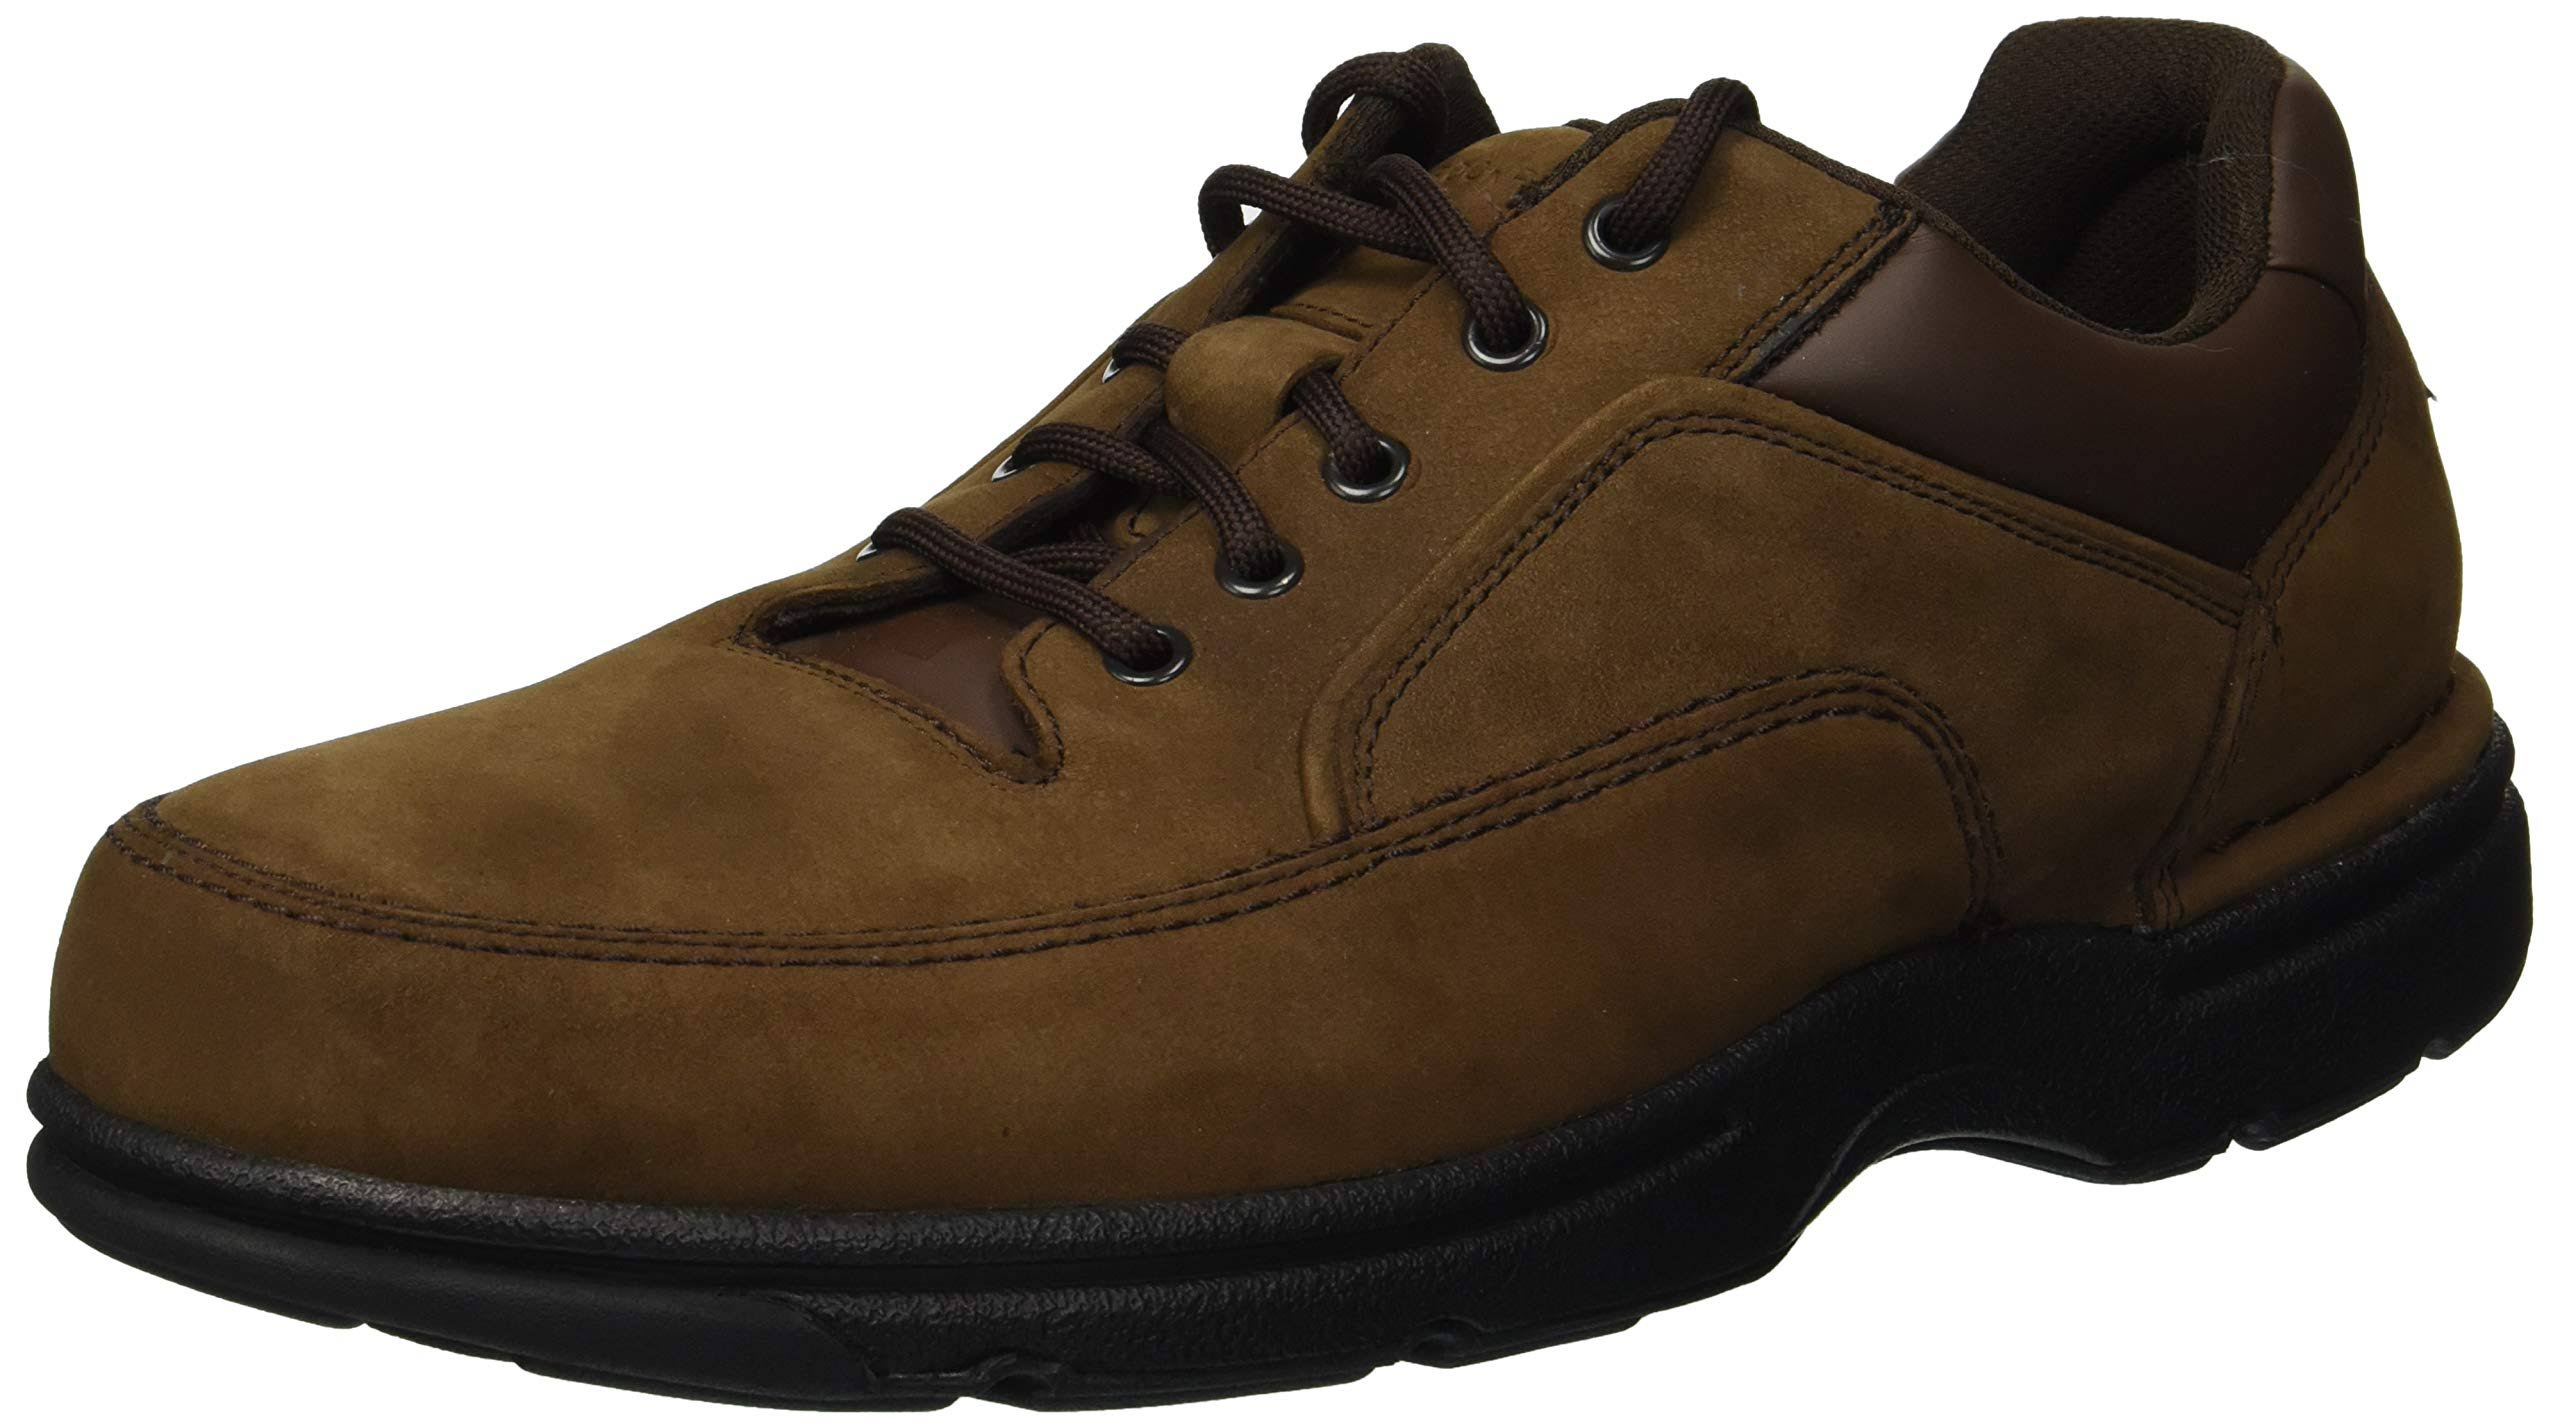 Herenschoenen Eureka Chocolate Rockport Nubuck Walking Shoe yvf6gY7b